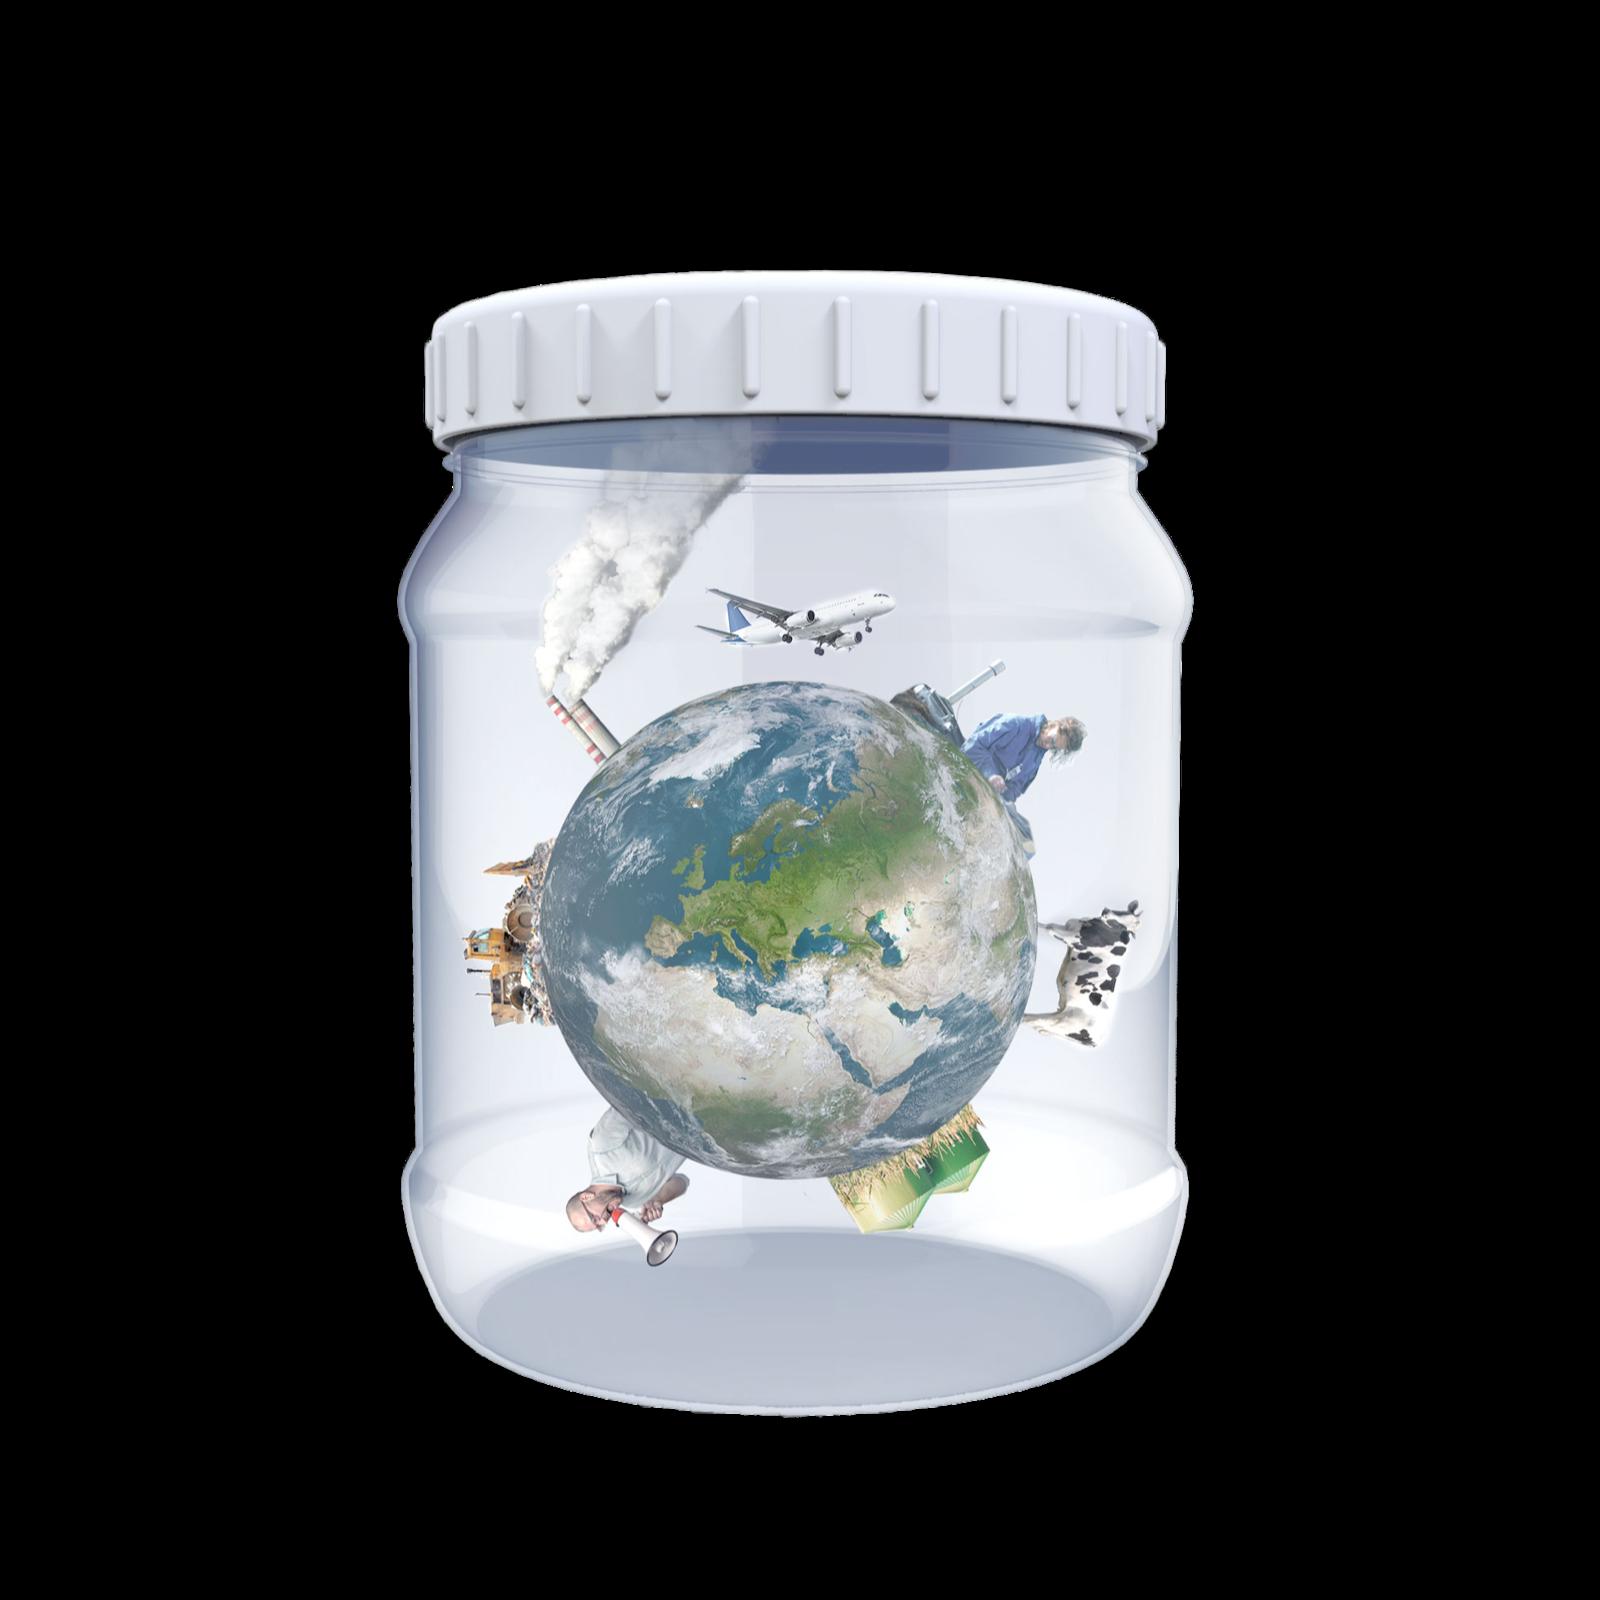 Environmental odour analysis, assessment & control